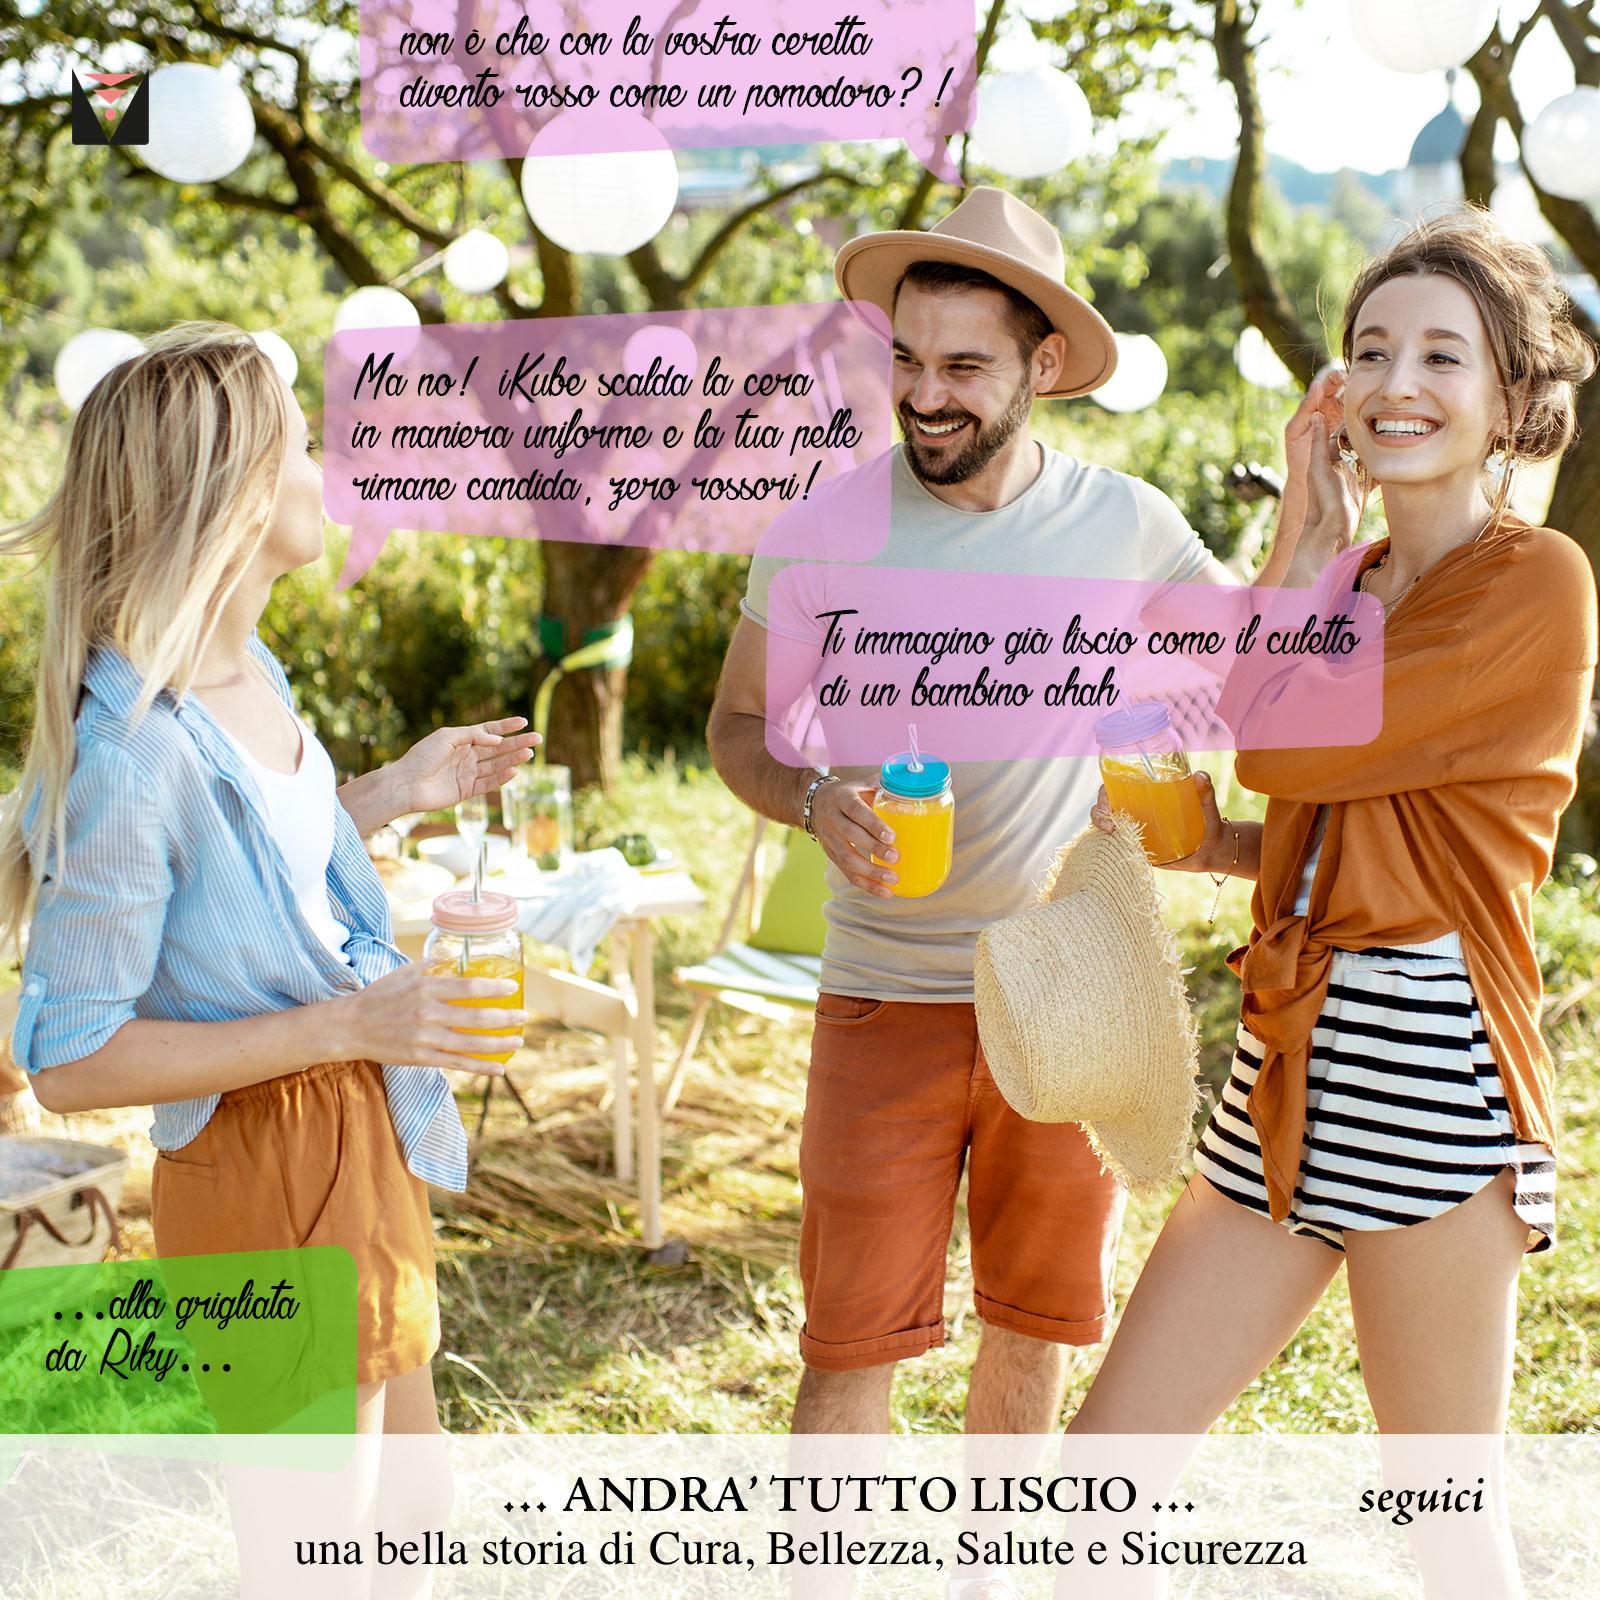 Andra_tutto_liscio_Kubes_solutions